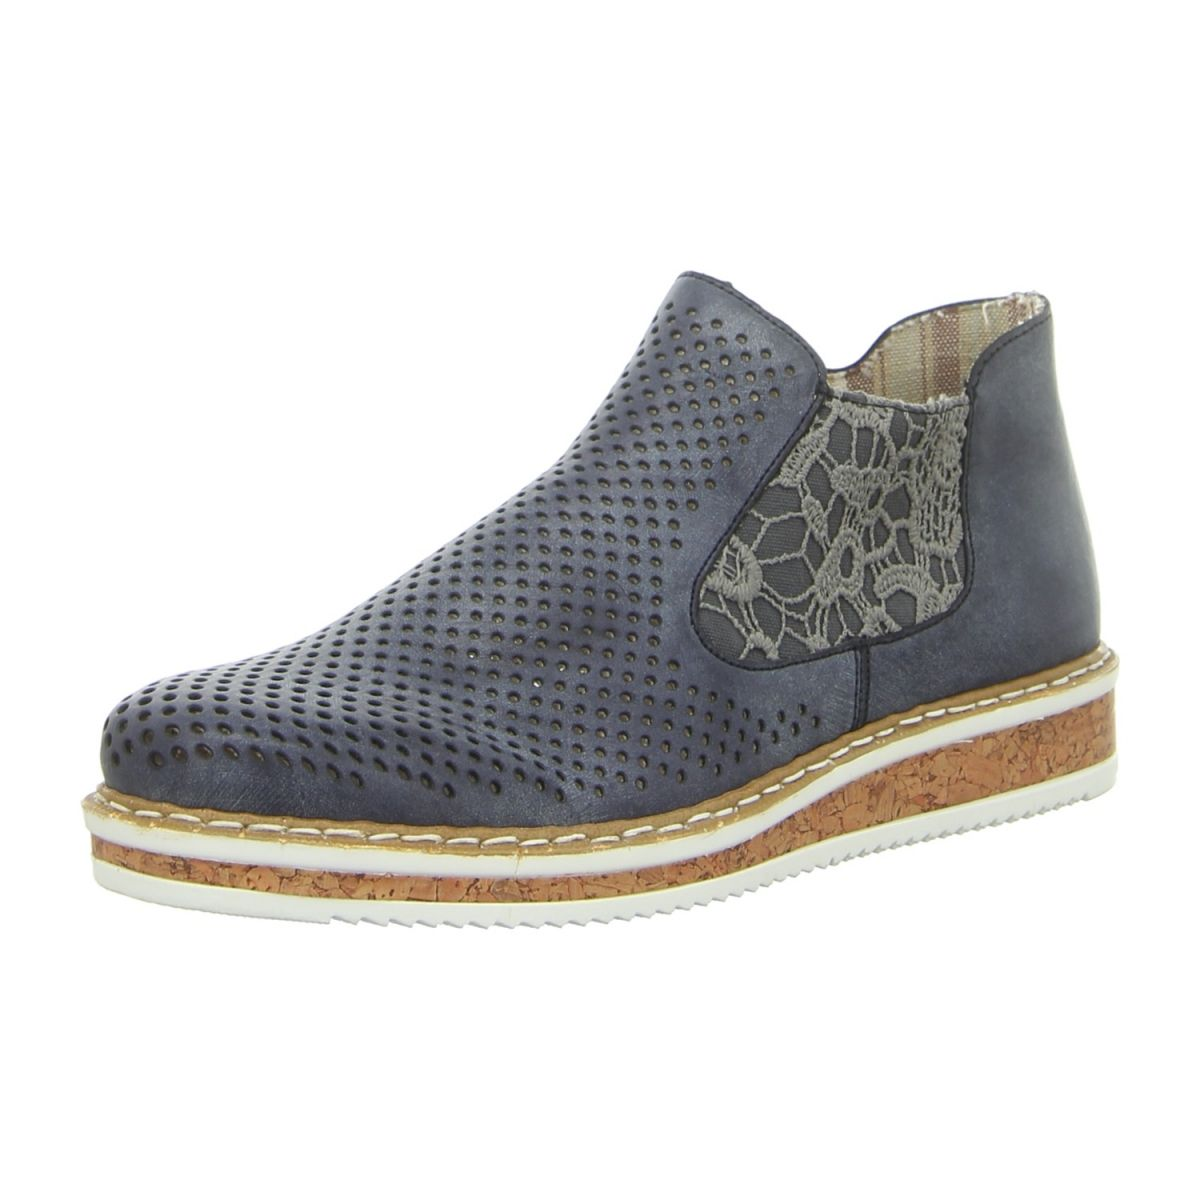 NEU: Rieker Stiefeletten N0356 14 blau | Schuhe damen